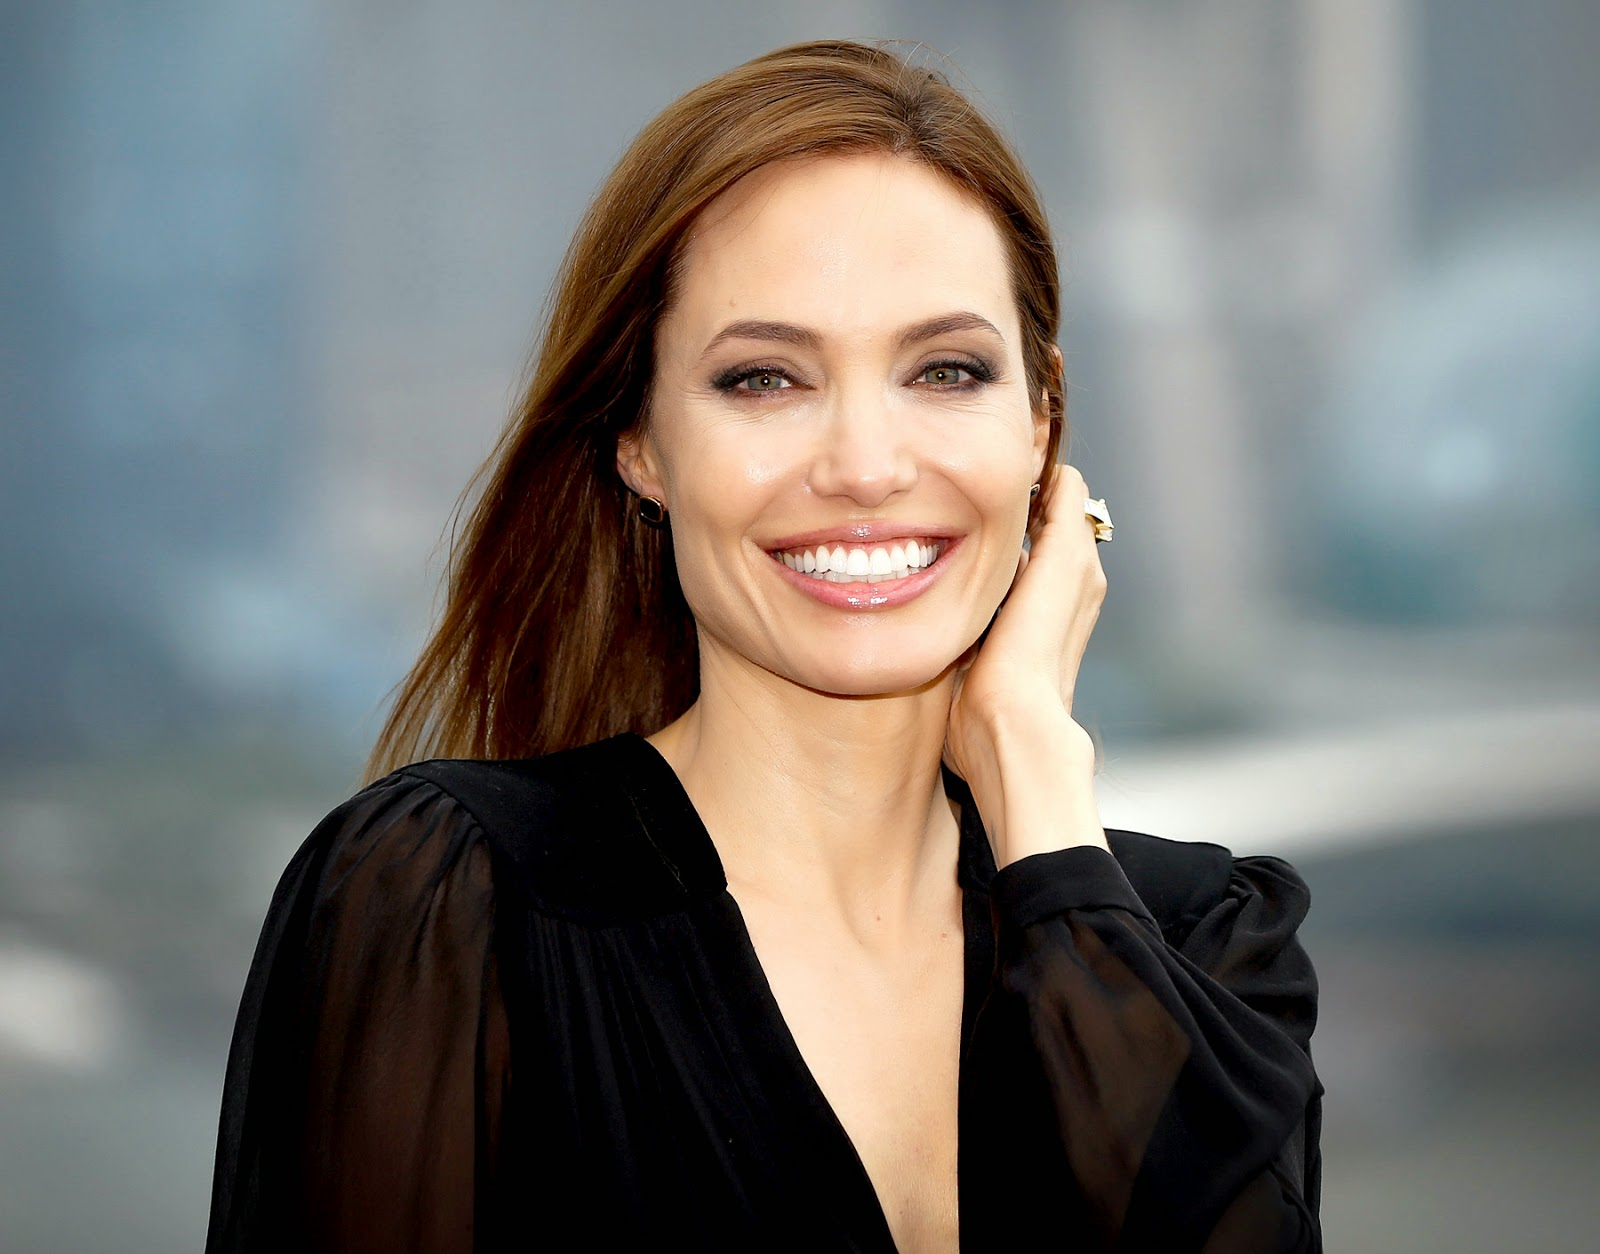 Paparazzi Uma Jolie naked (44 photo), Topless, Paparazzi, Selfie, underwear 2018